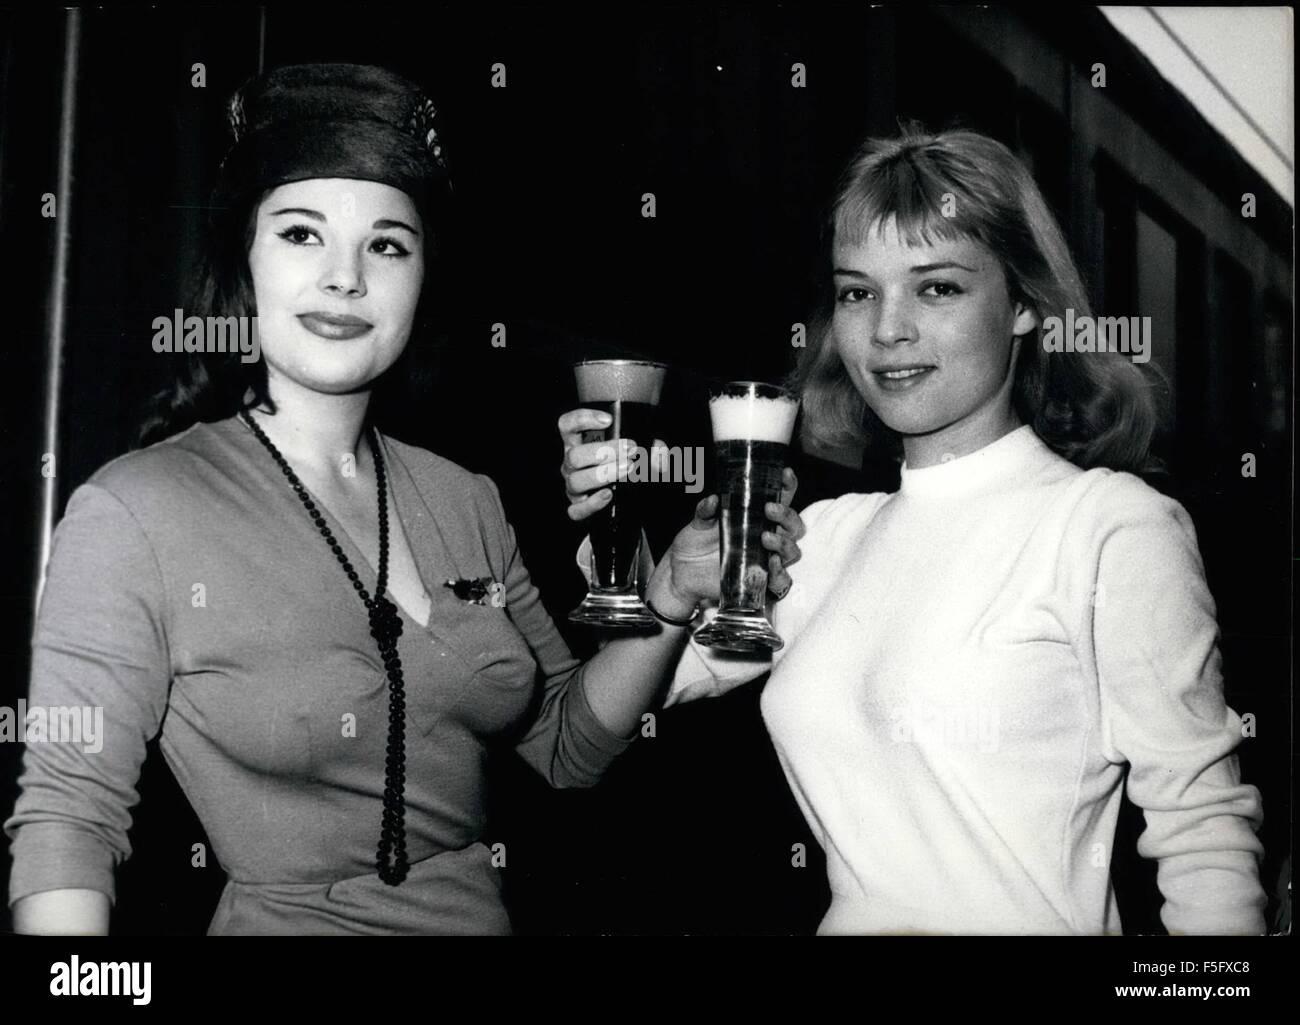 Laine MacNeil,Lucy Scott Hot images Marlene Forte,Betsy Brandt